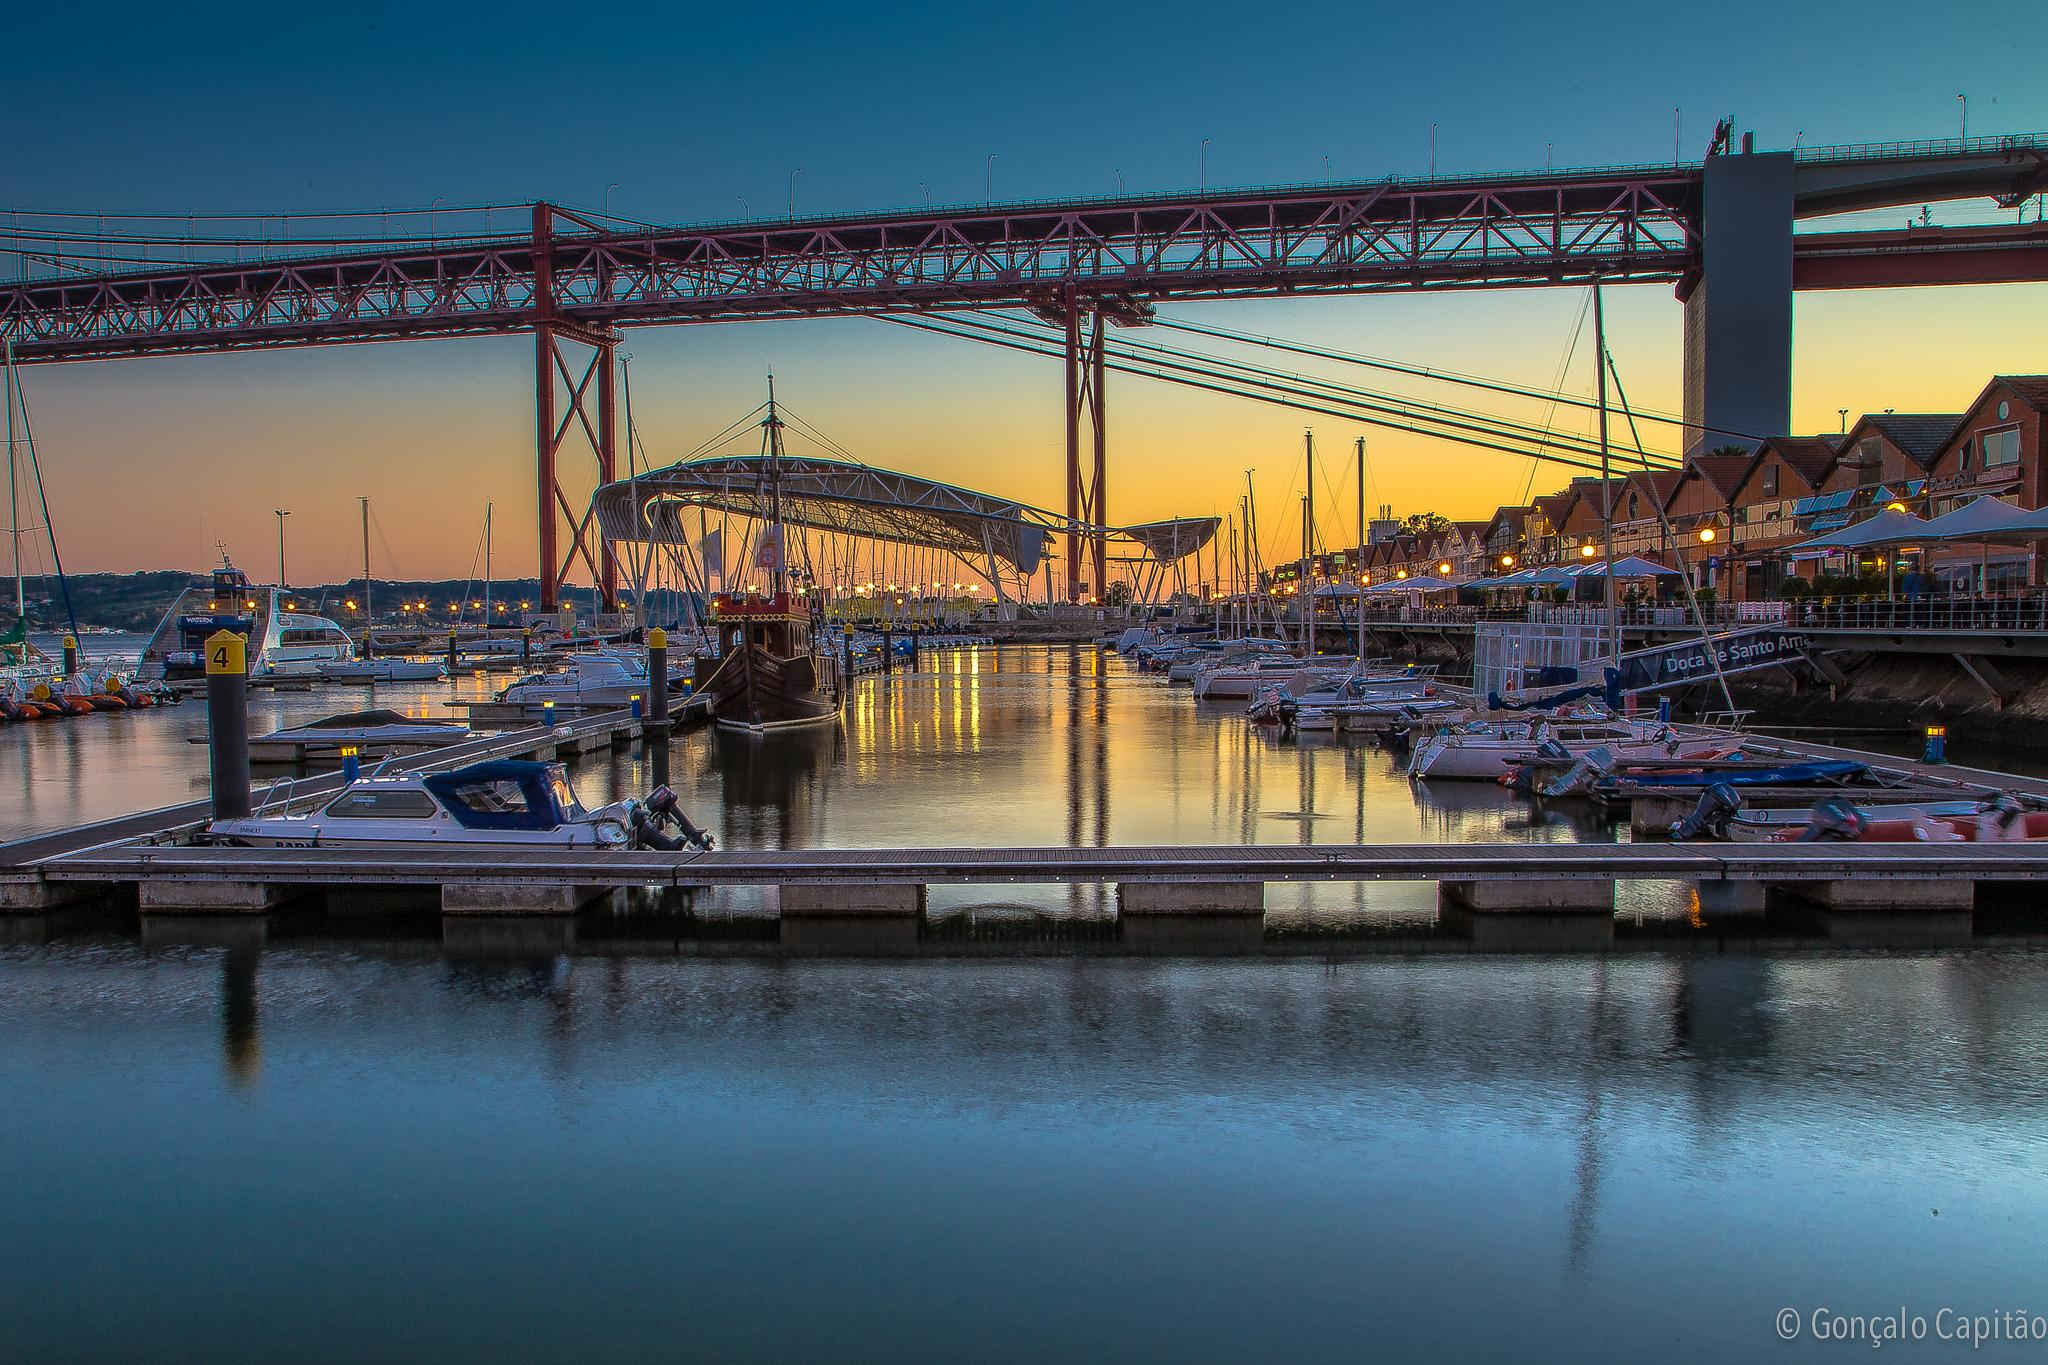 Santo Amaro dock by goncaloacapitao